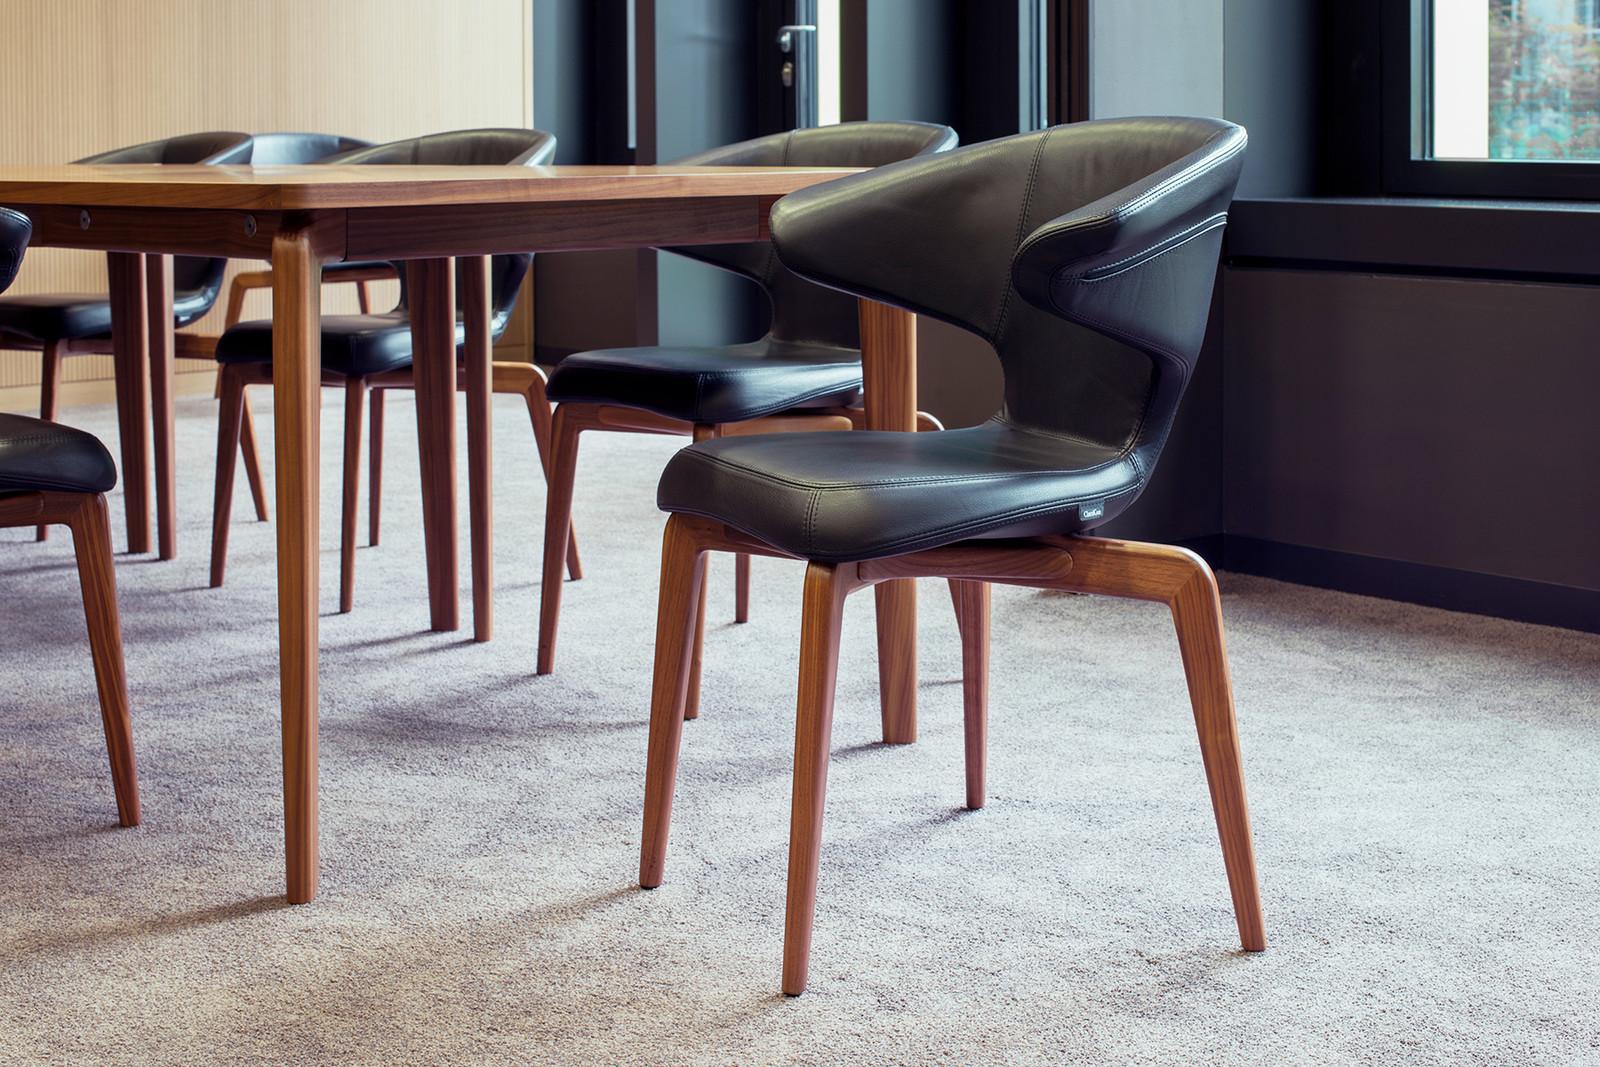 Design Classicon Usm Designer Möbel Innenausstattung L5Aj3qR4